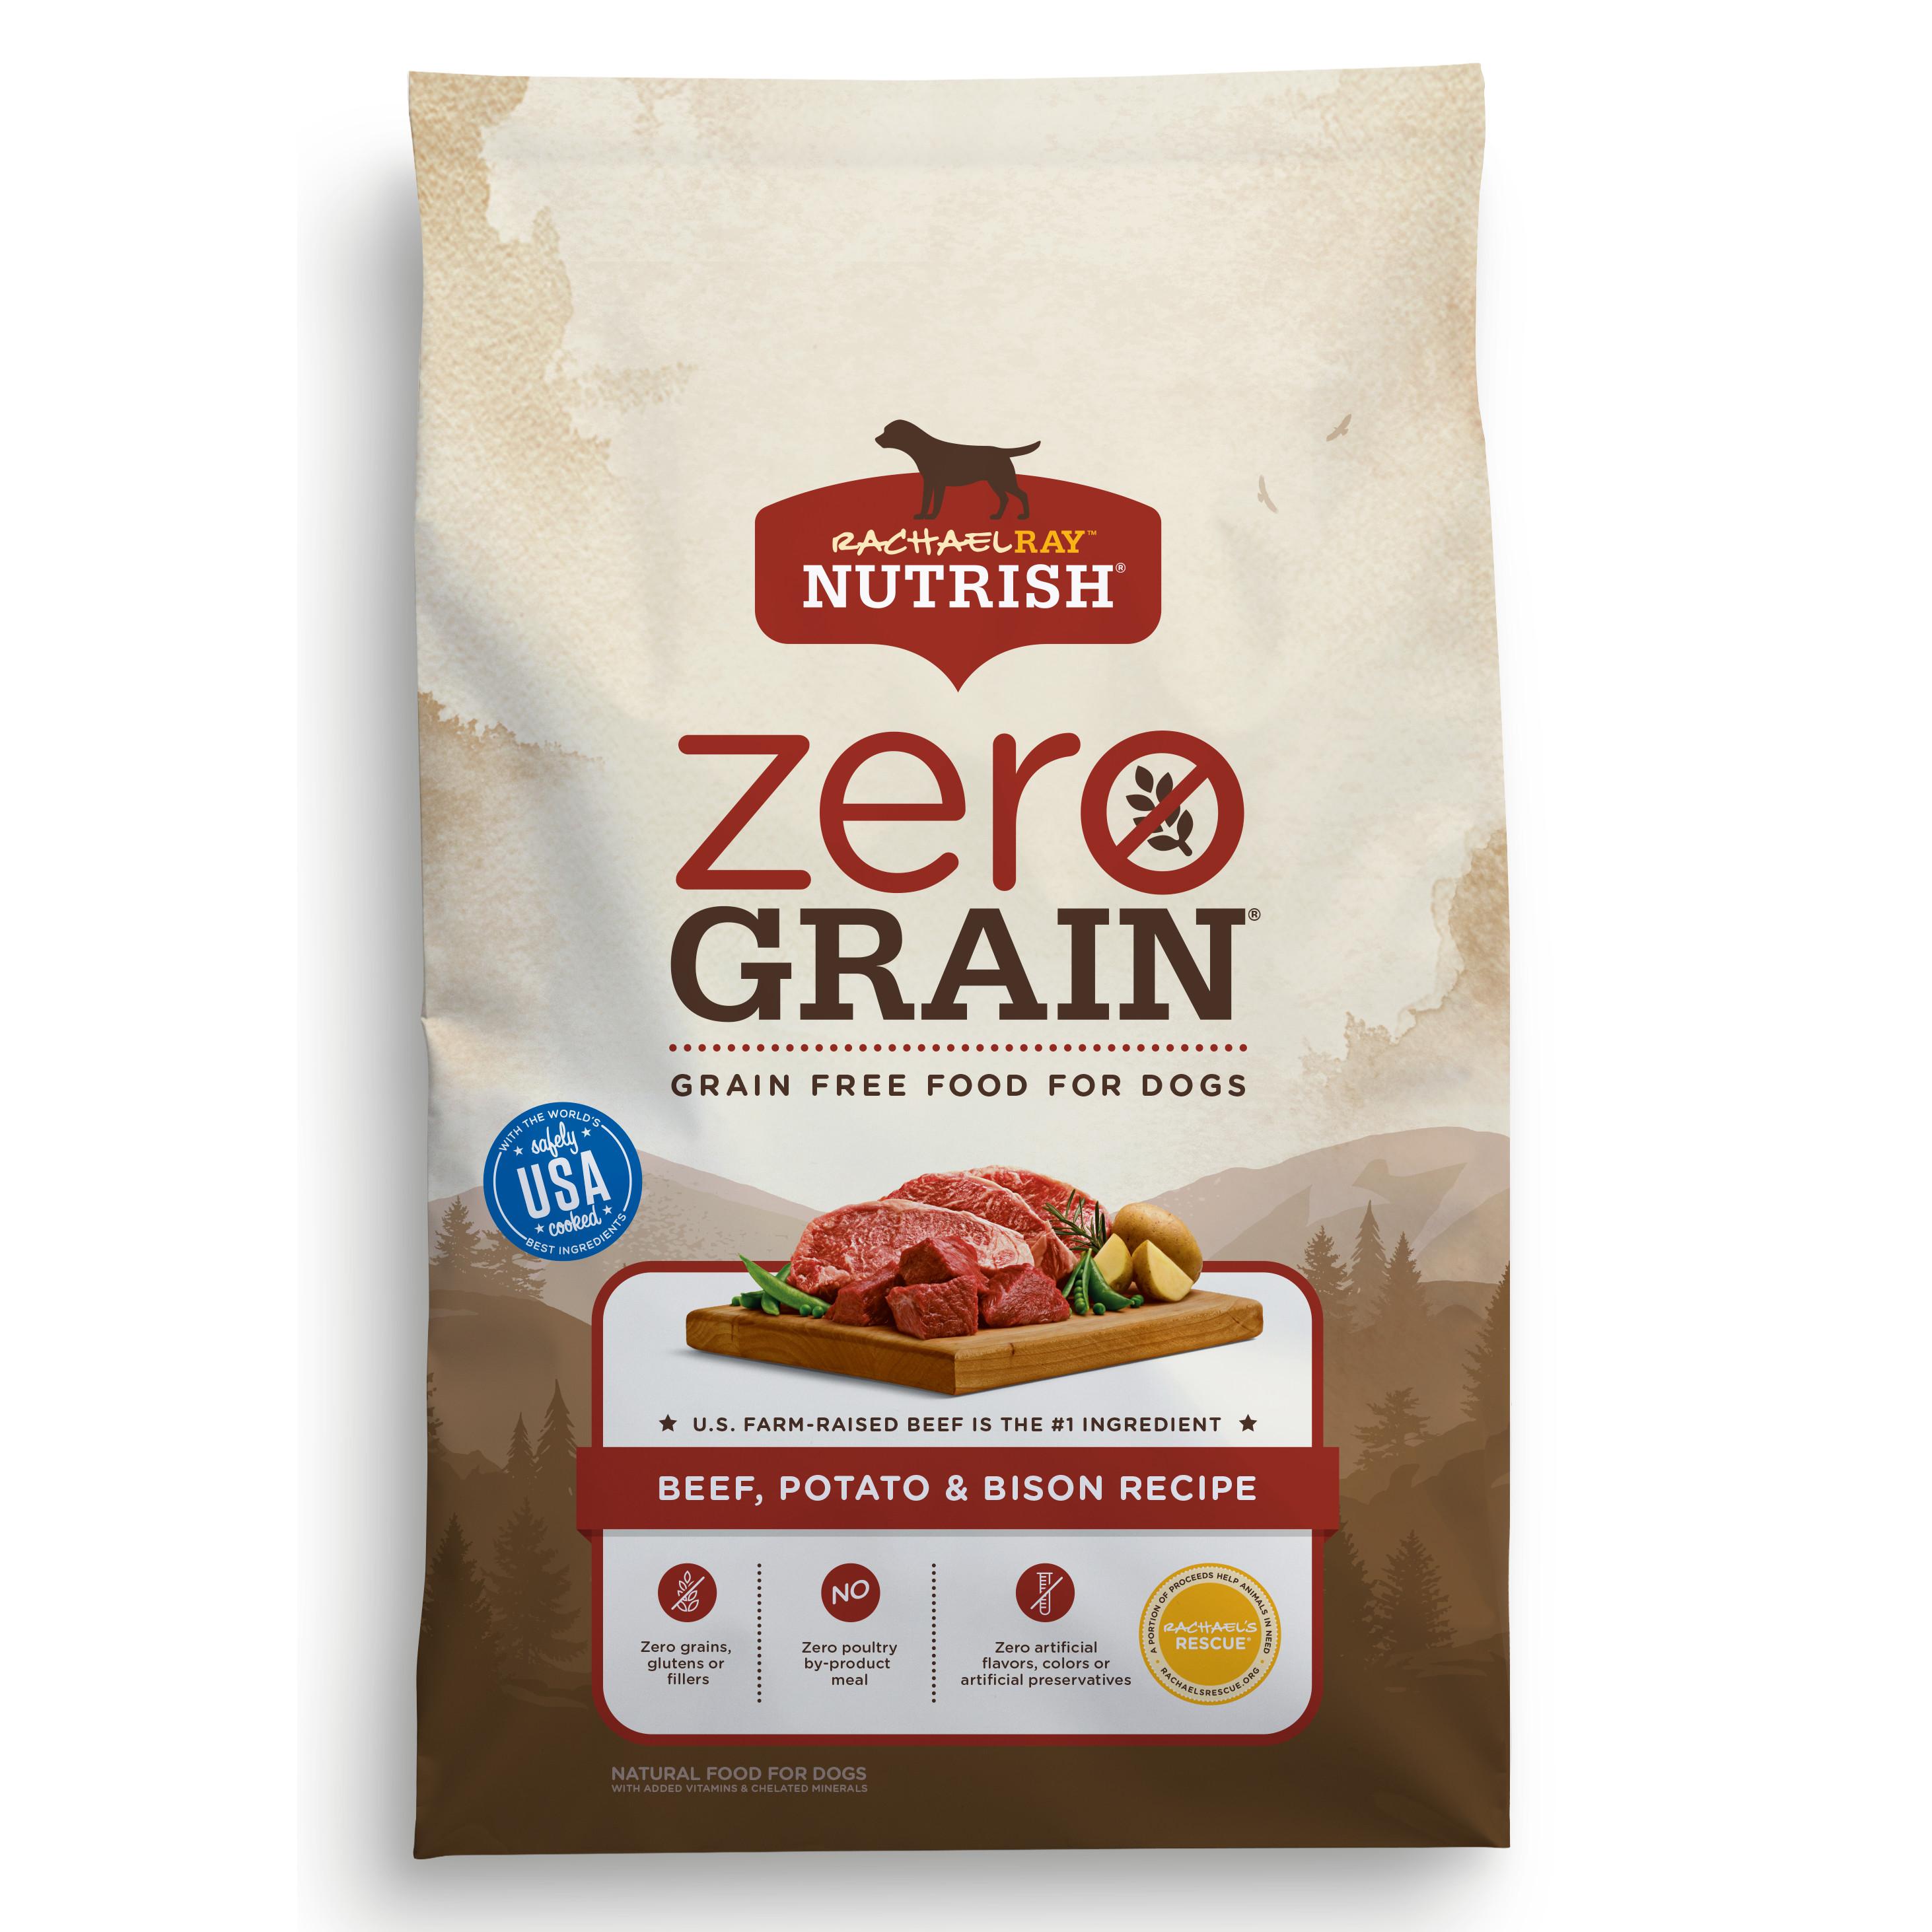 Rachael Ray Nutrish Zero Grain Natural Dry Dog Food, Beef, Potato & Bison